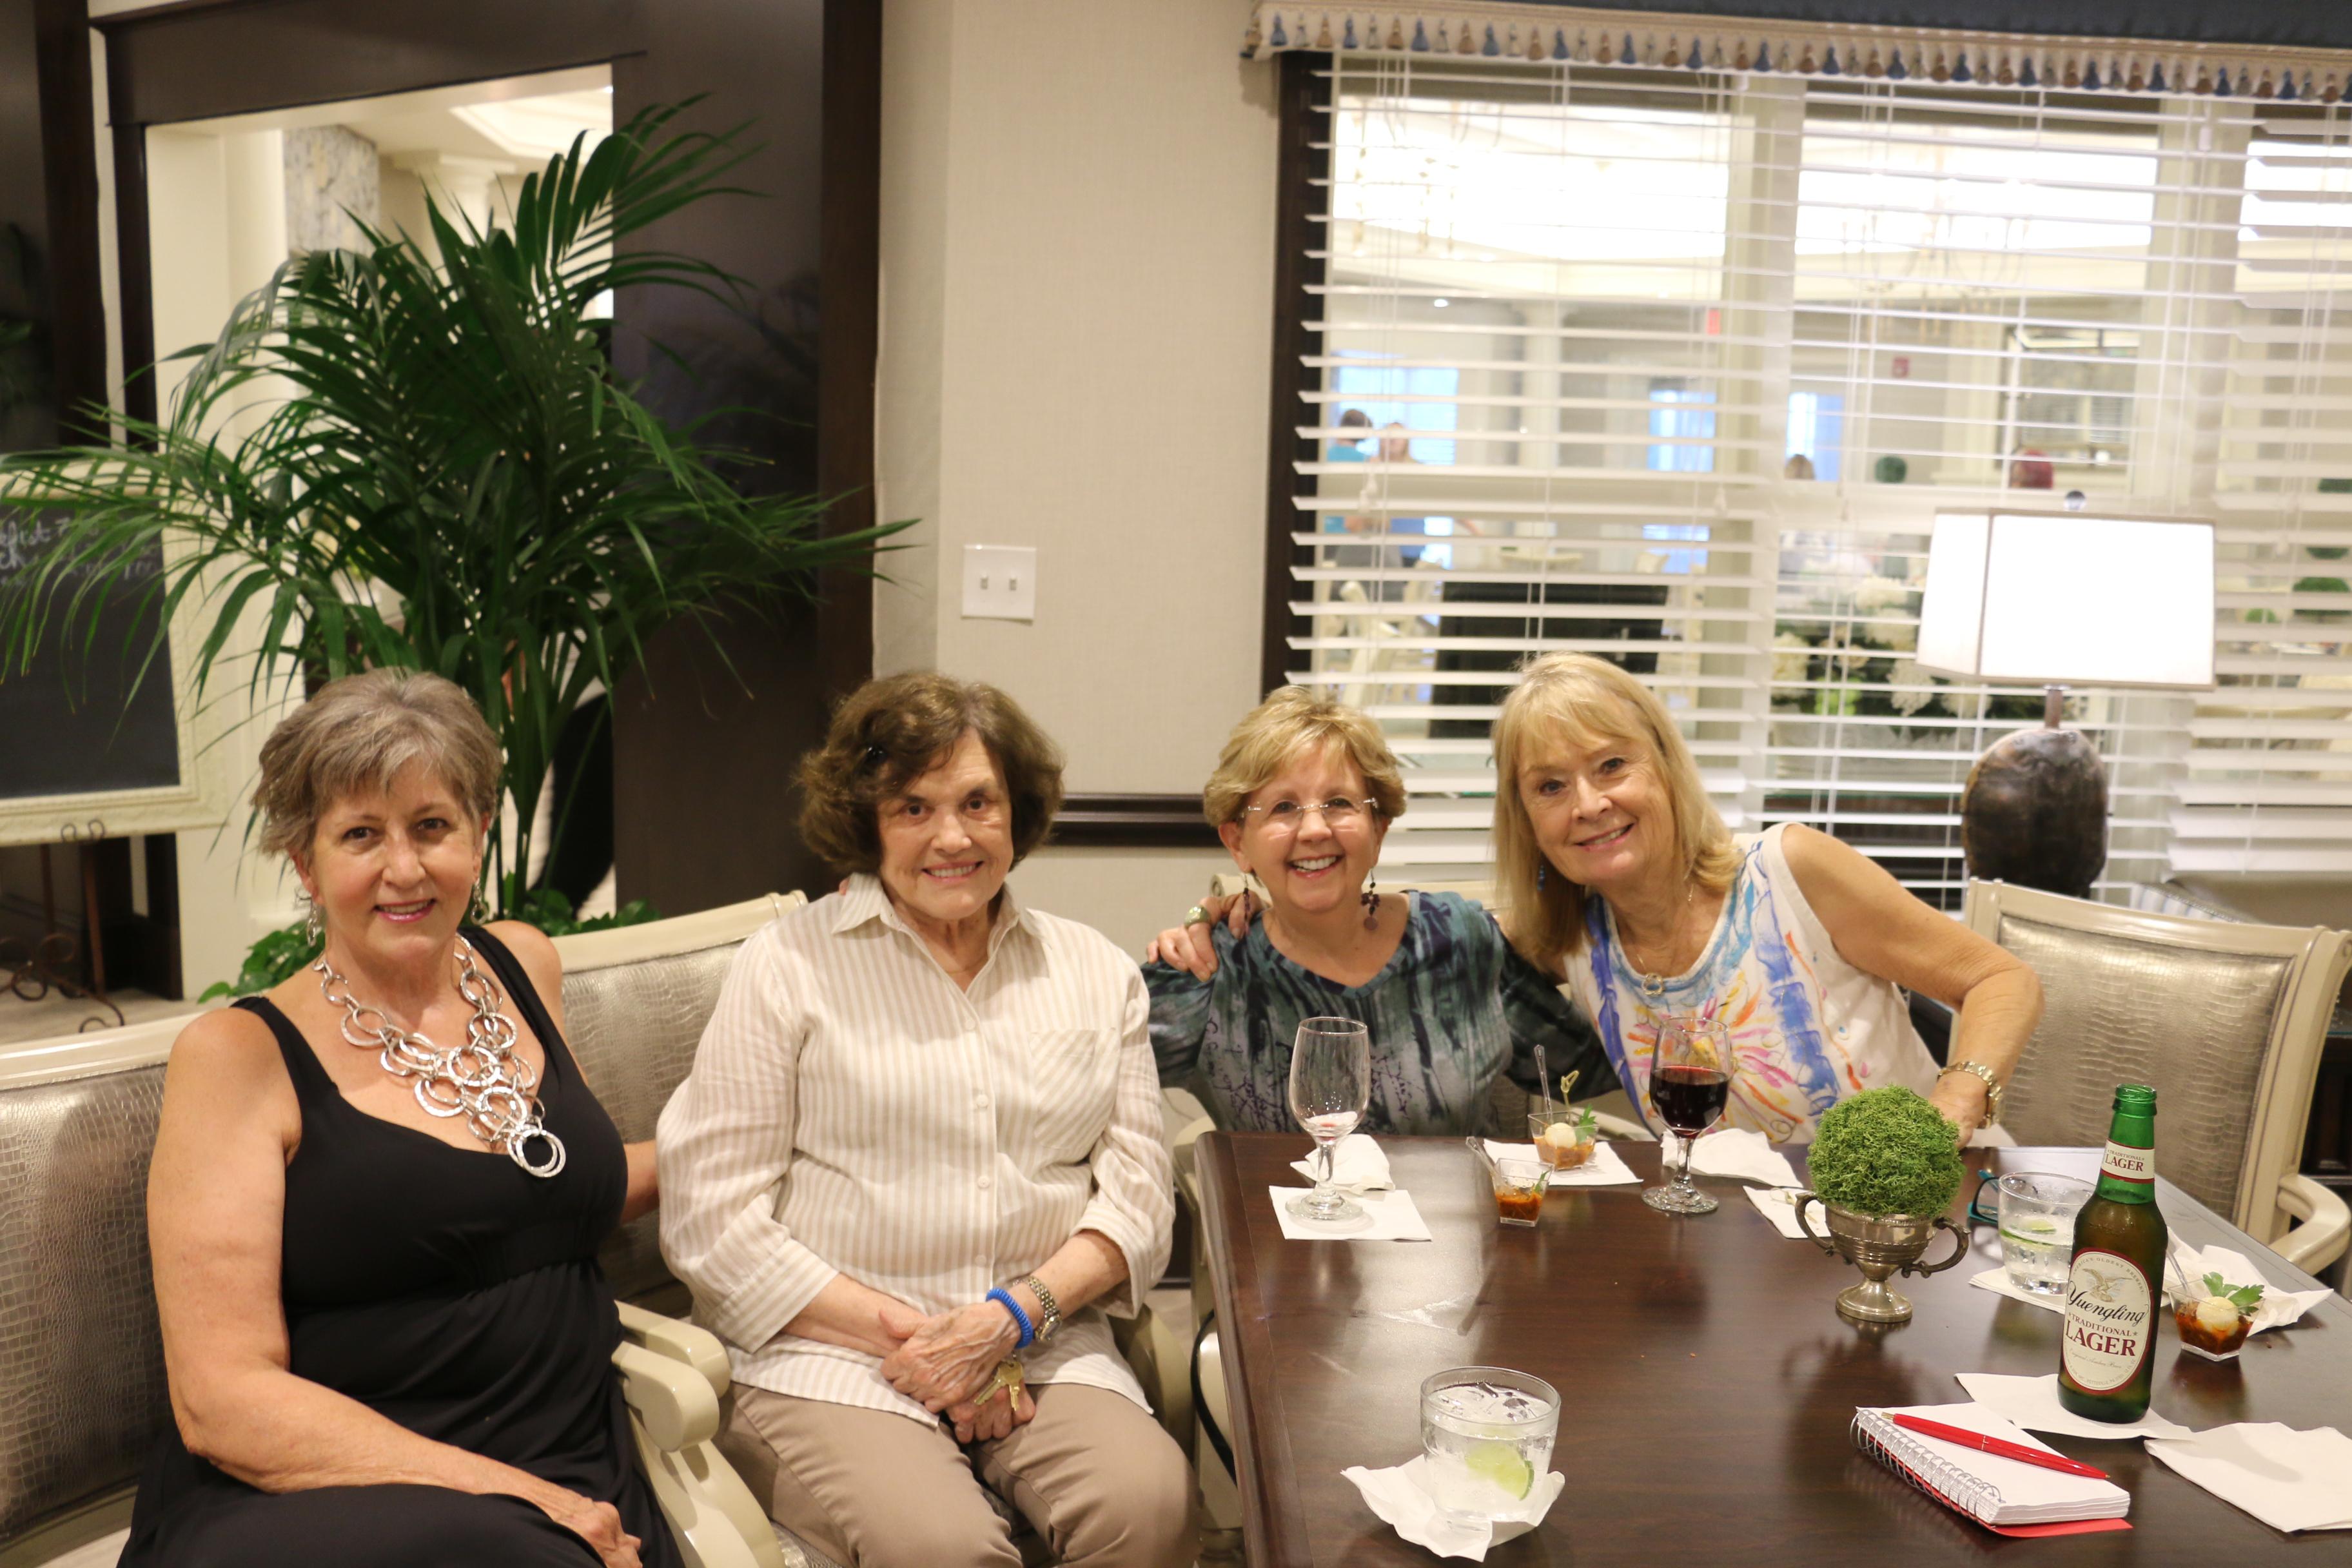 Emalynn Tate, Helen Wagner, Carol Heilman and Kathie Harvey.